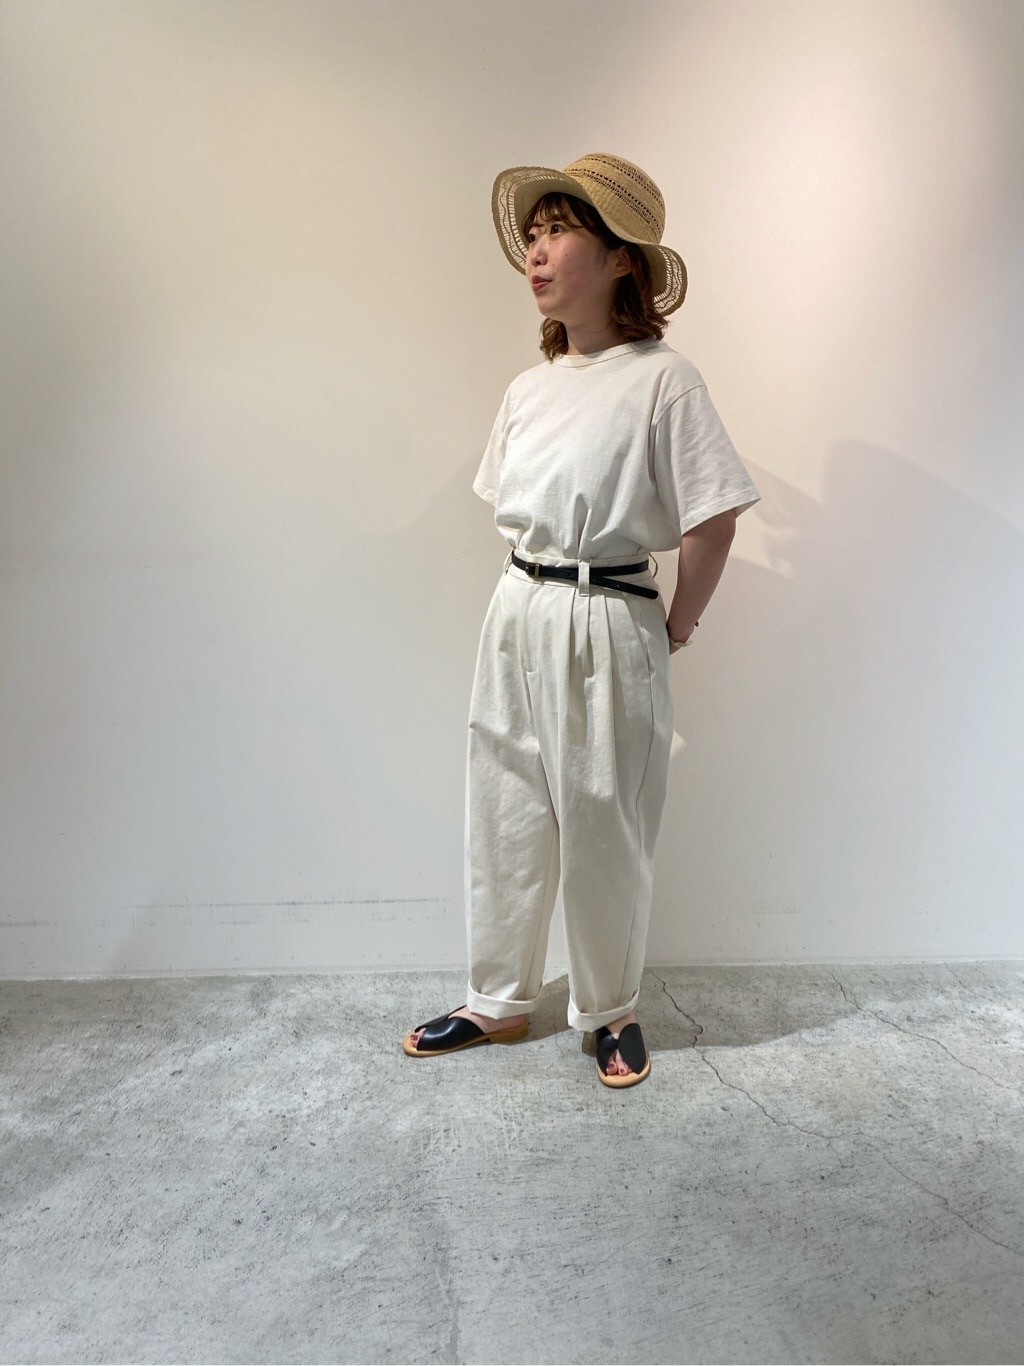 chambre de charme 京都路面 身長:150cm 2020.05.29